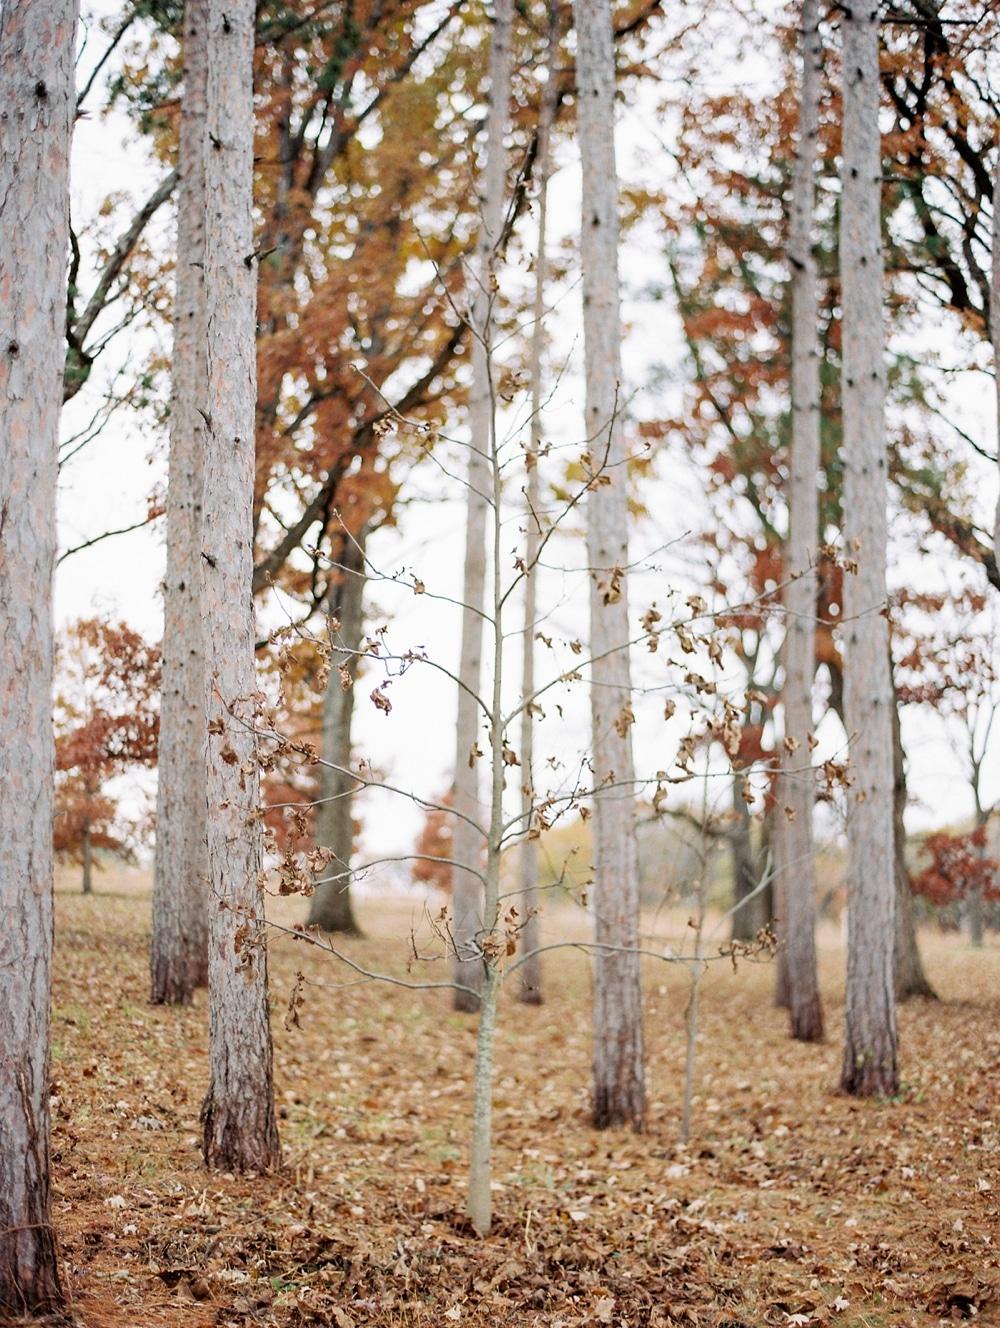 Kristin-La-Voie-Photography-morton-arboretum-chicago-wedding-photographer-1-2